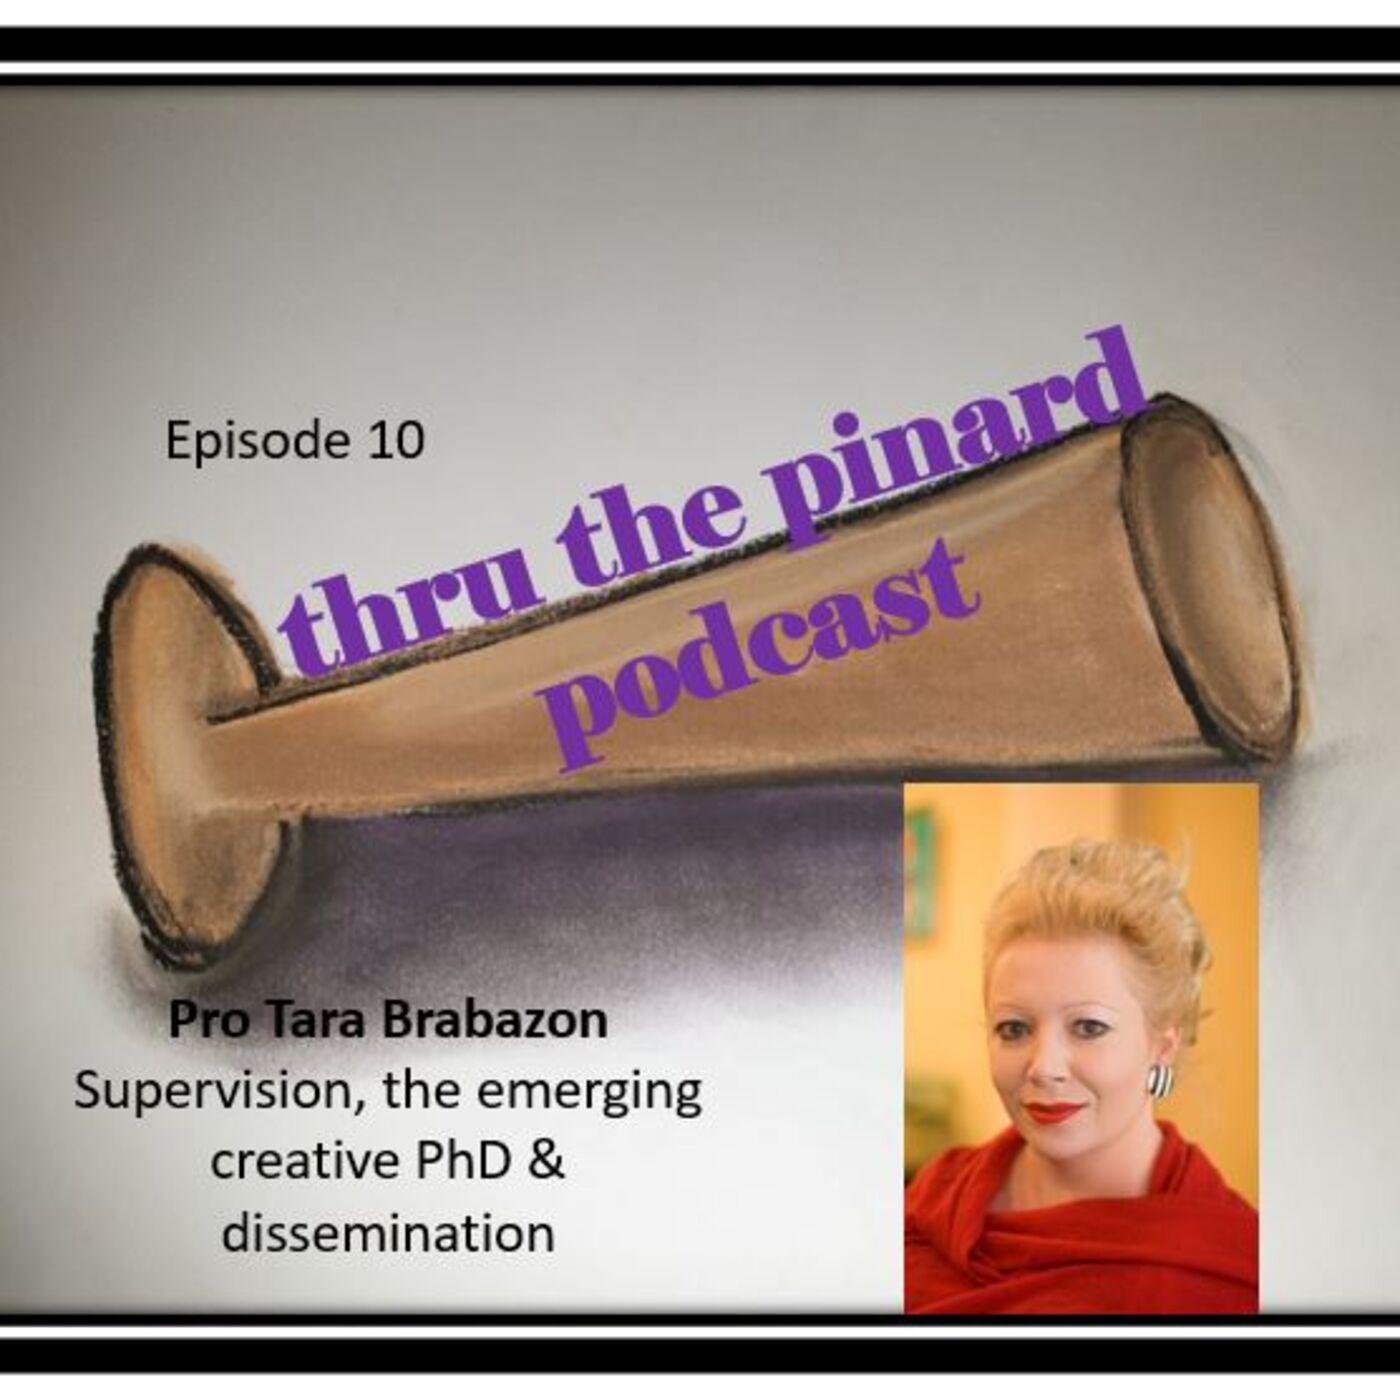 Episode 10 Tara Brabazon - Supervision, the emerging creative PhD & dissemination